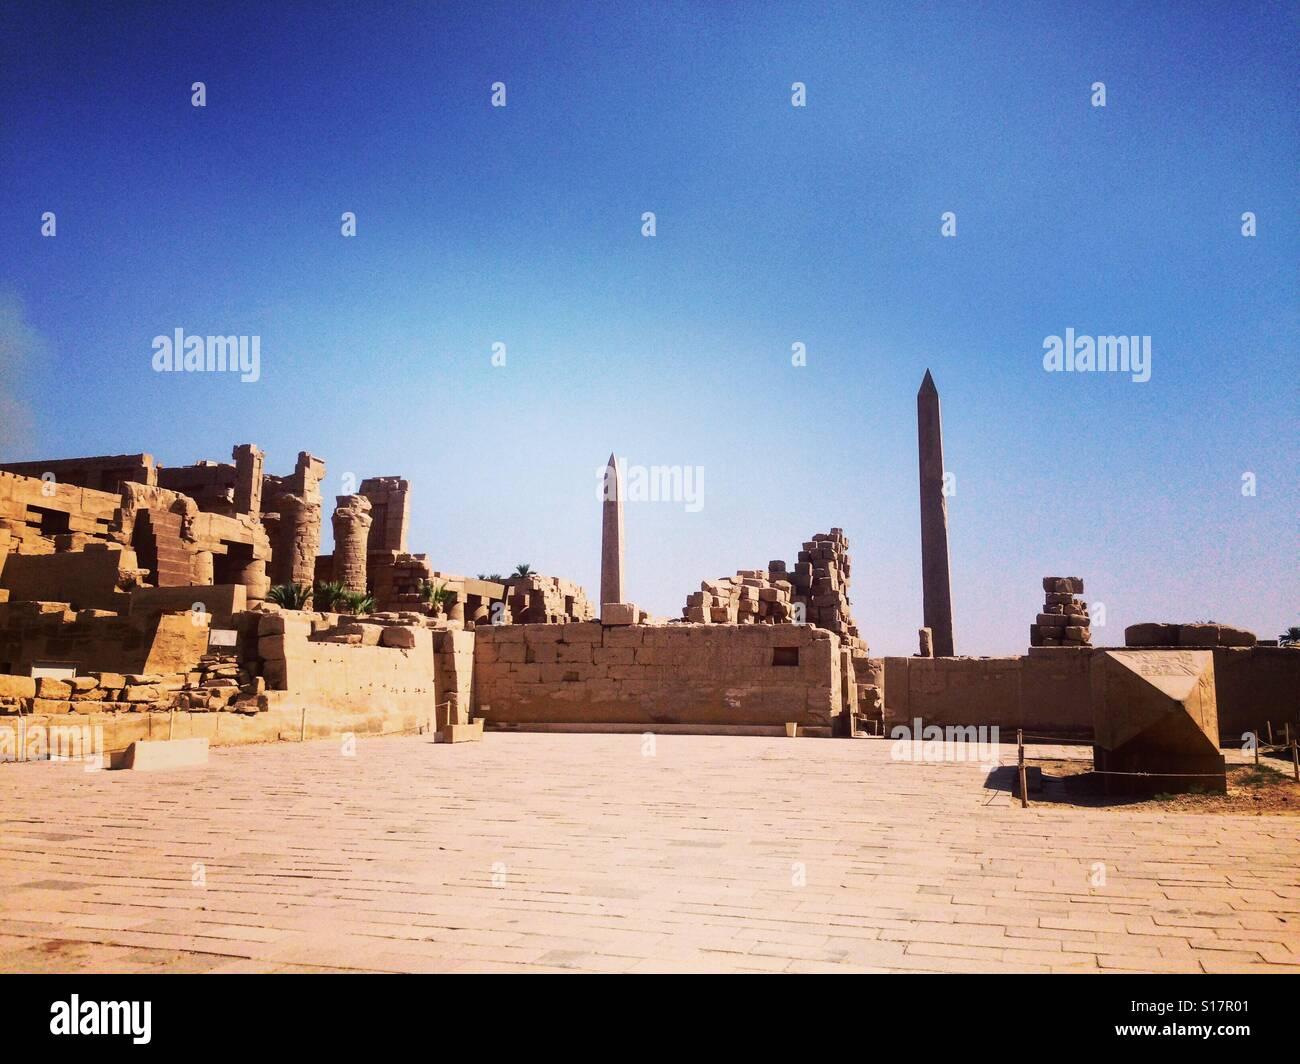 Parte posterior del templo de Karnak, Luxor, Egipto Imagen De Stock